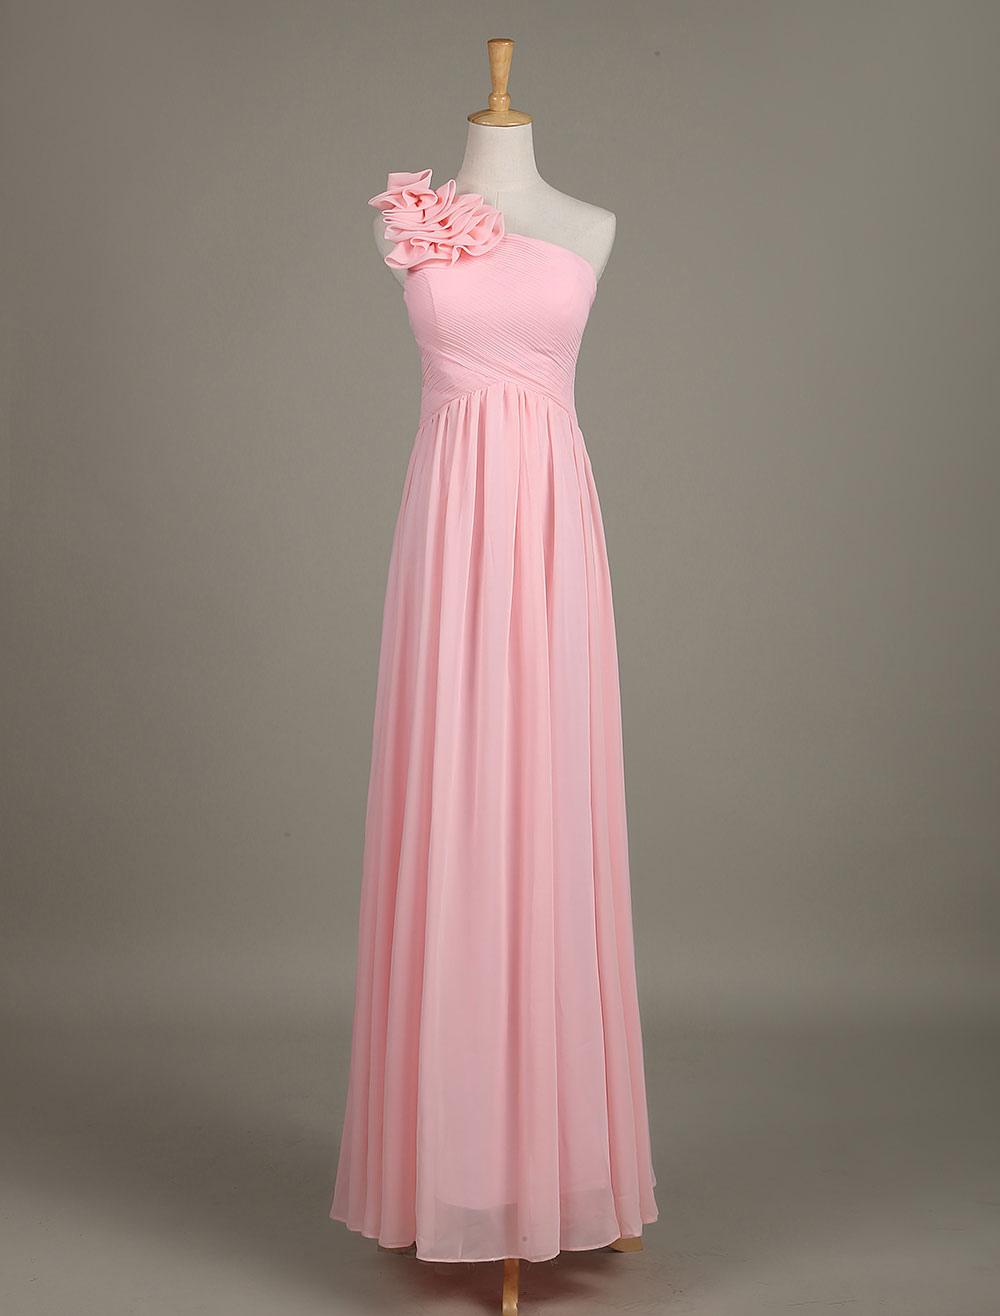 Blush Bridesmaid Dress Chiffon One Shoulder Ruffled Zipper A Line Long Wedding Party Dress